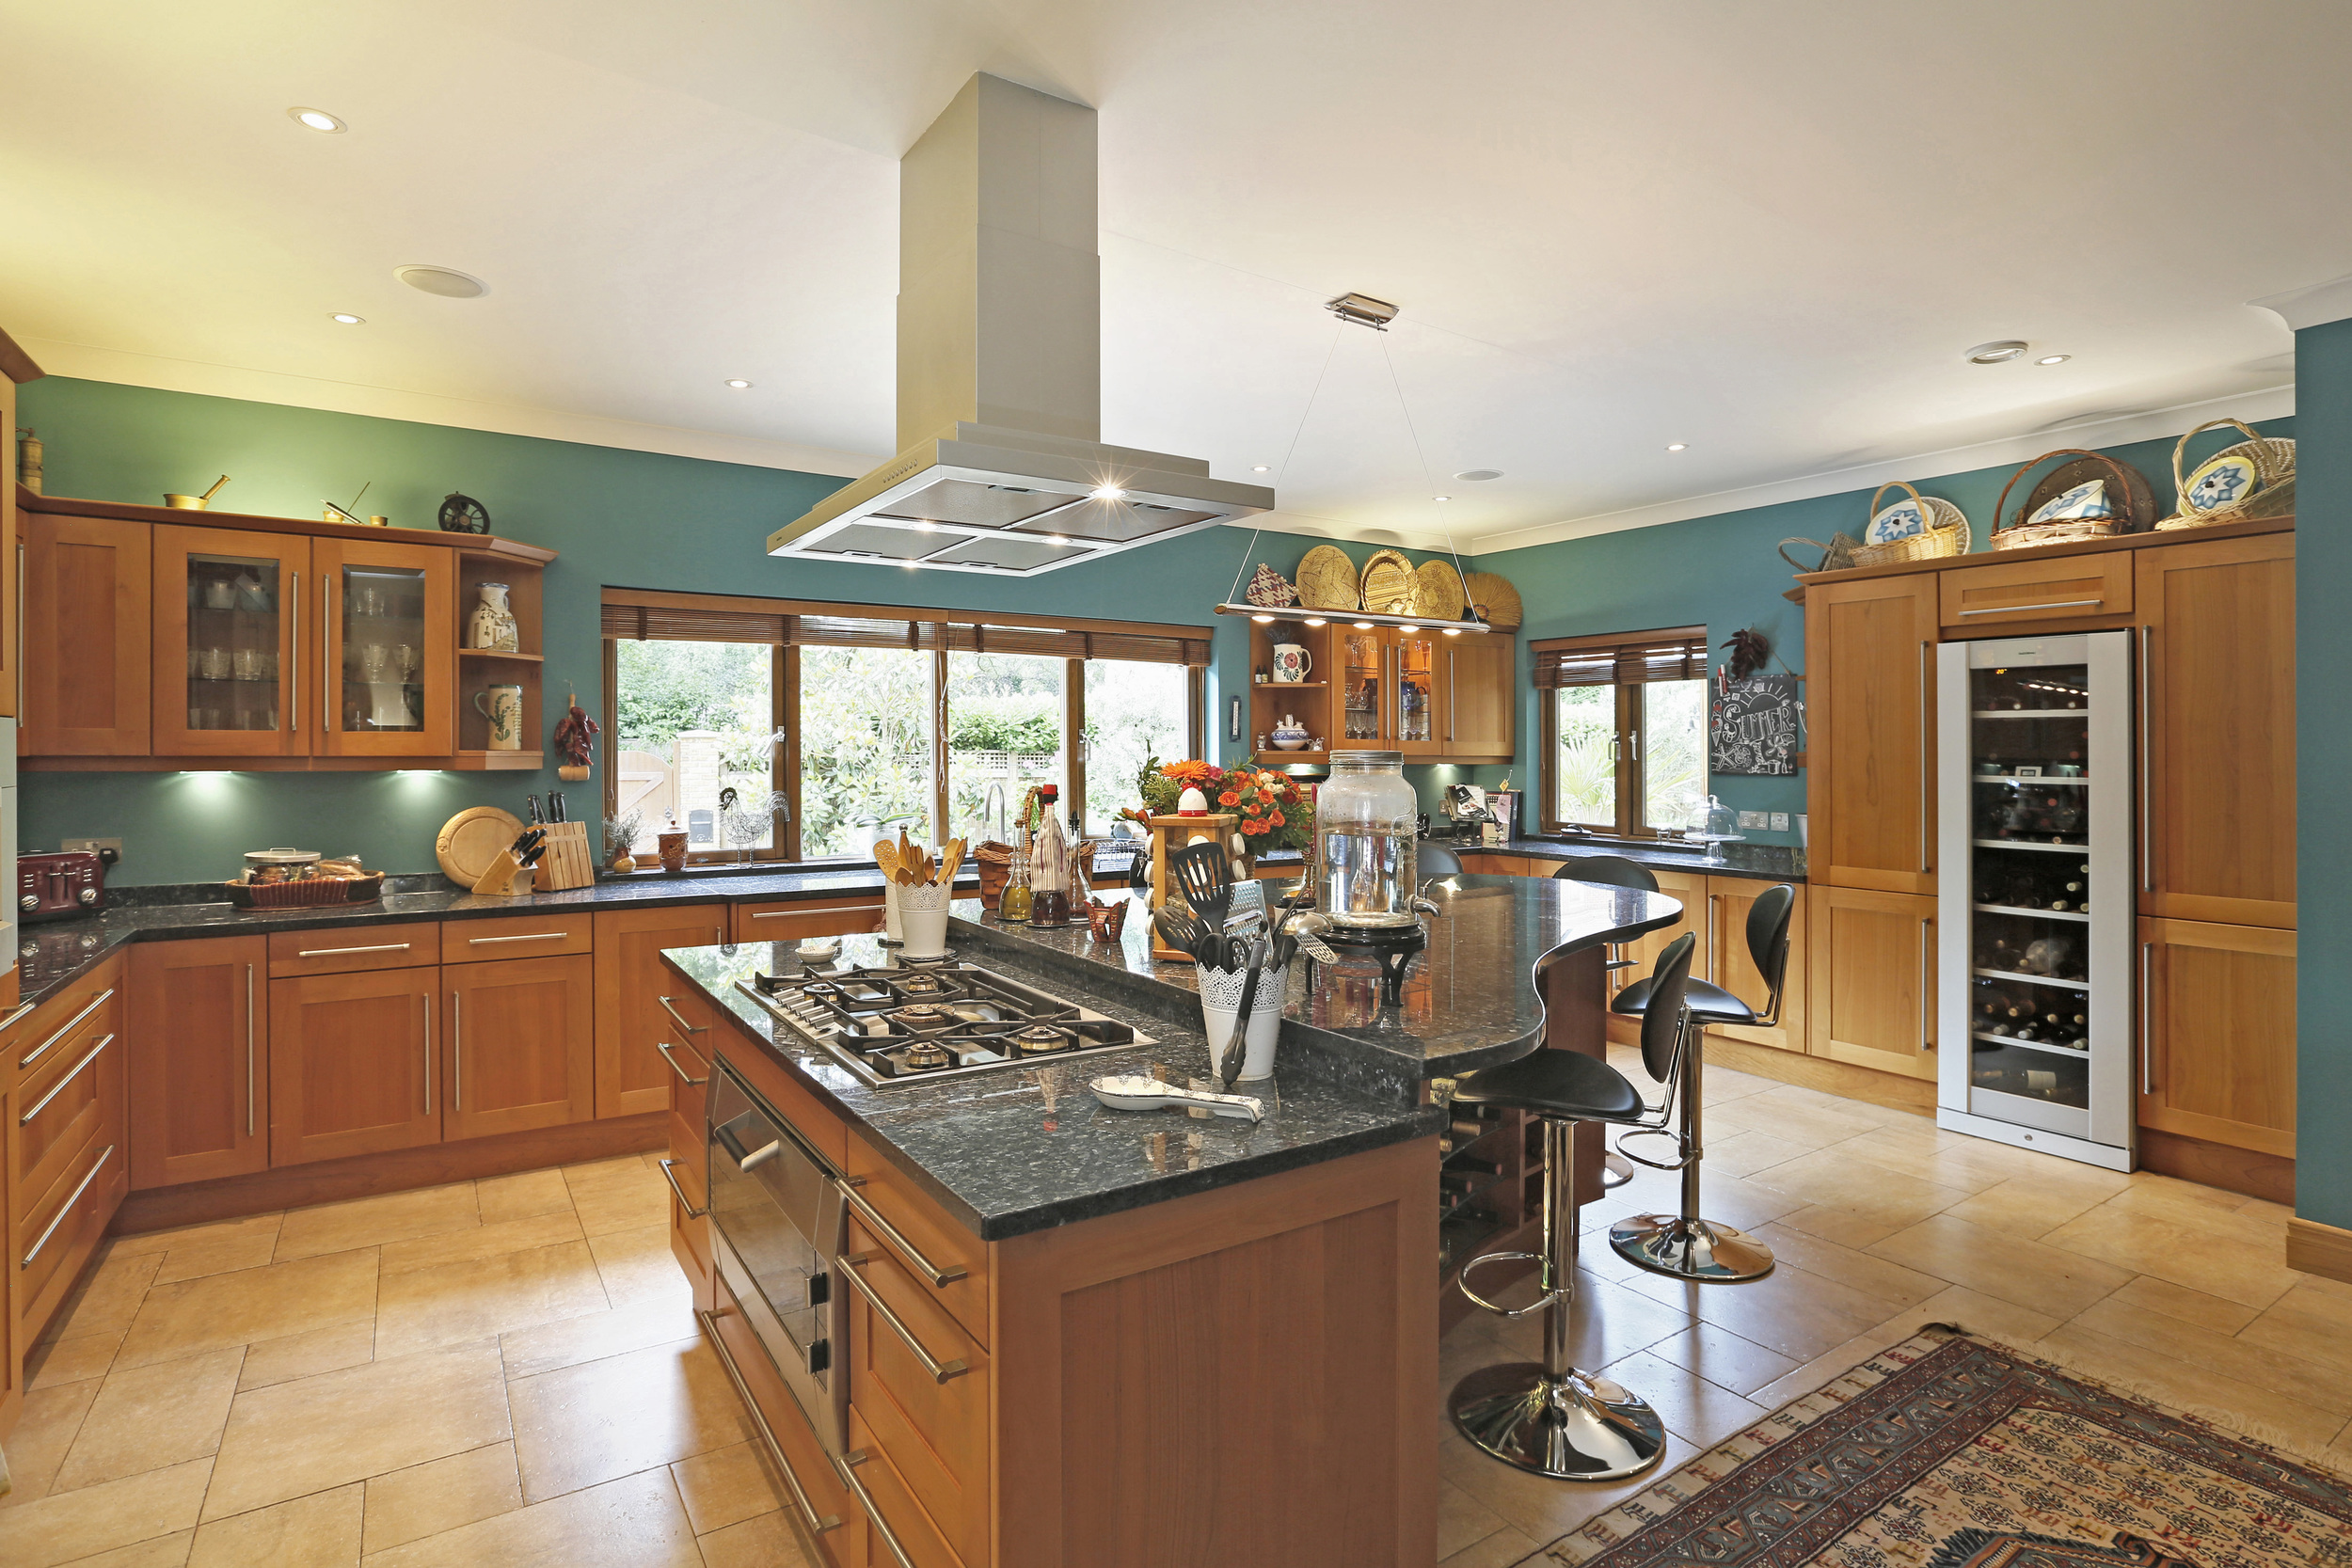 Coombeside - Kitchen.jpg